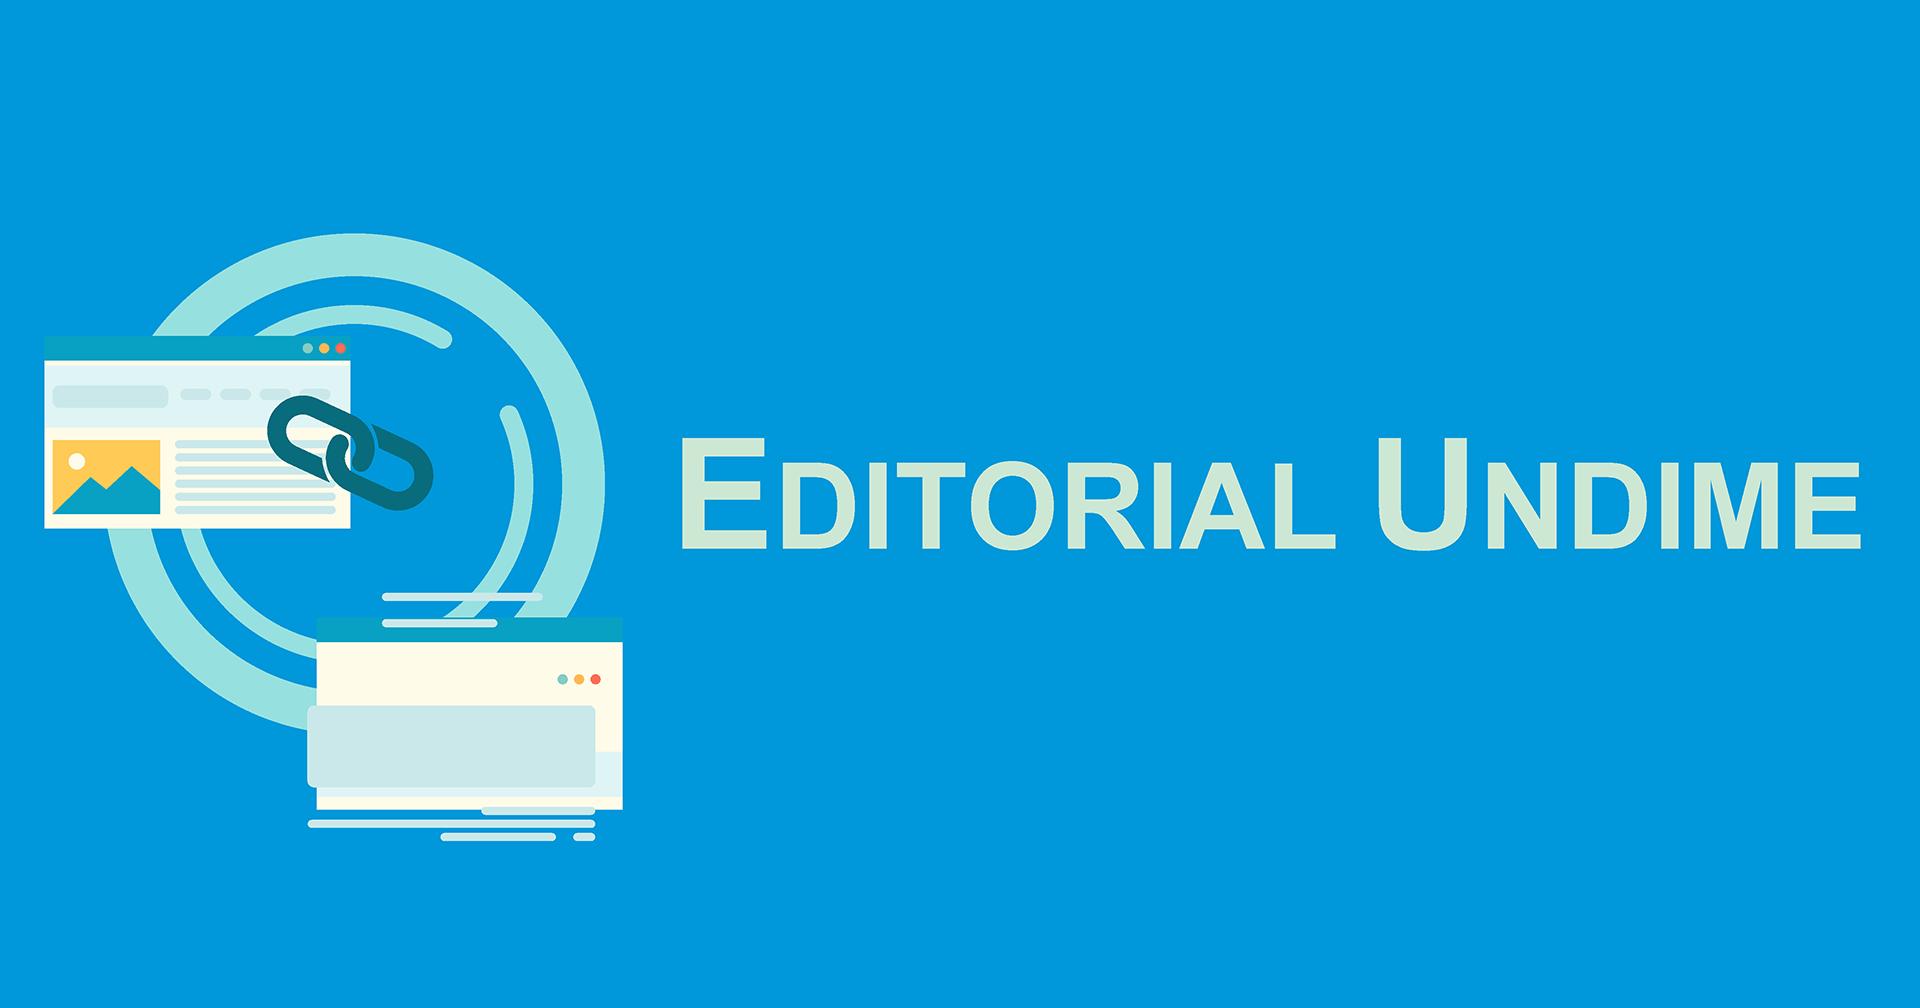 Editorial Undime